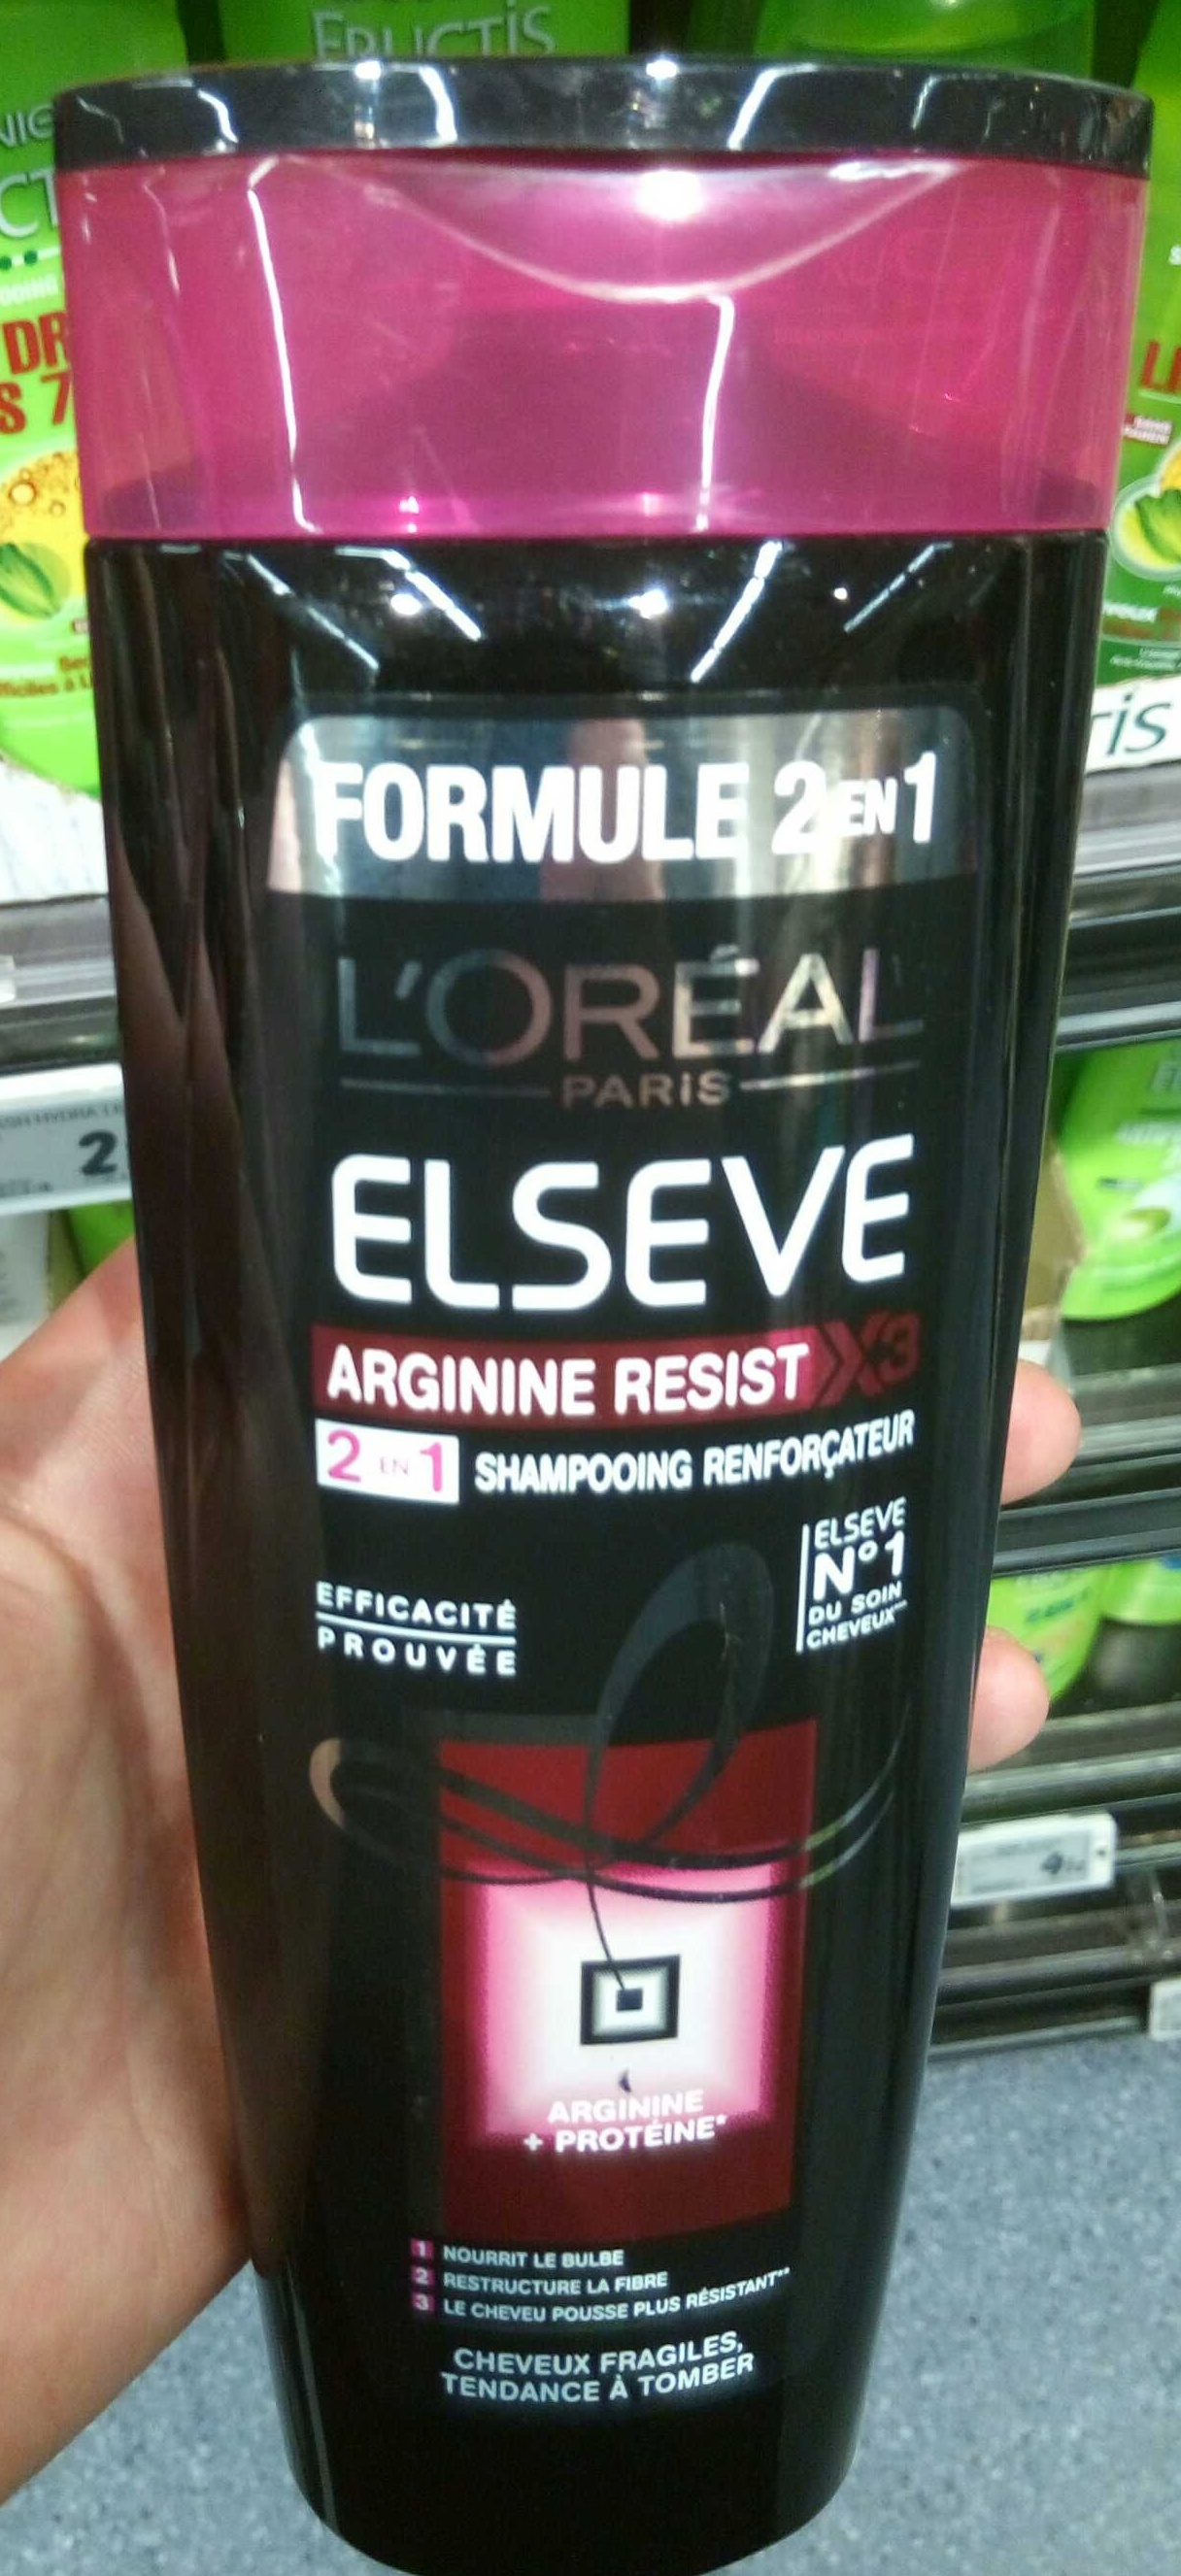 Elseve Arginine Resist X3 (Formule 2 en 1) - Produit - fr